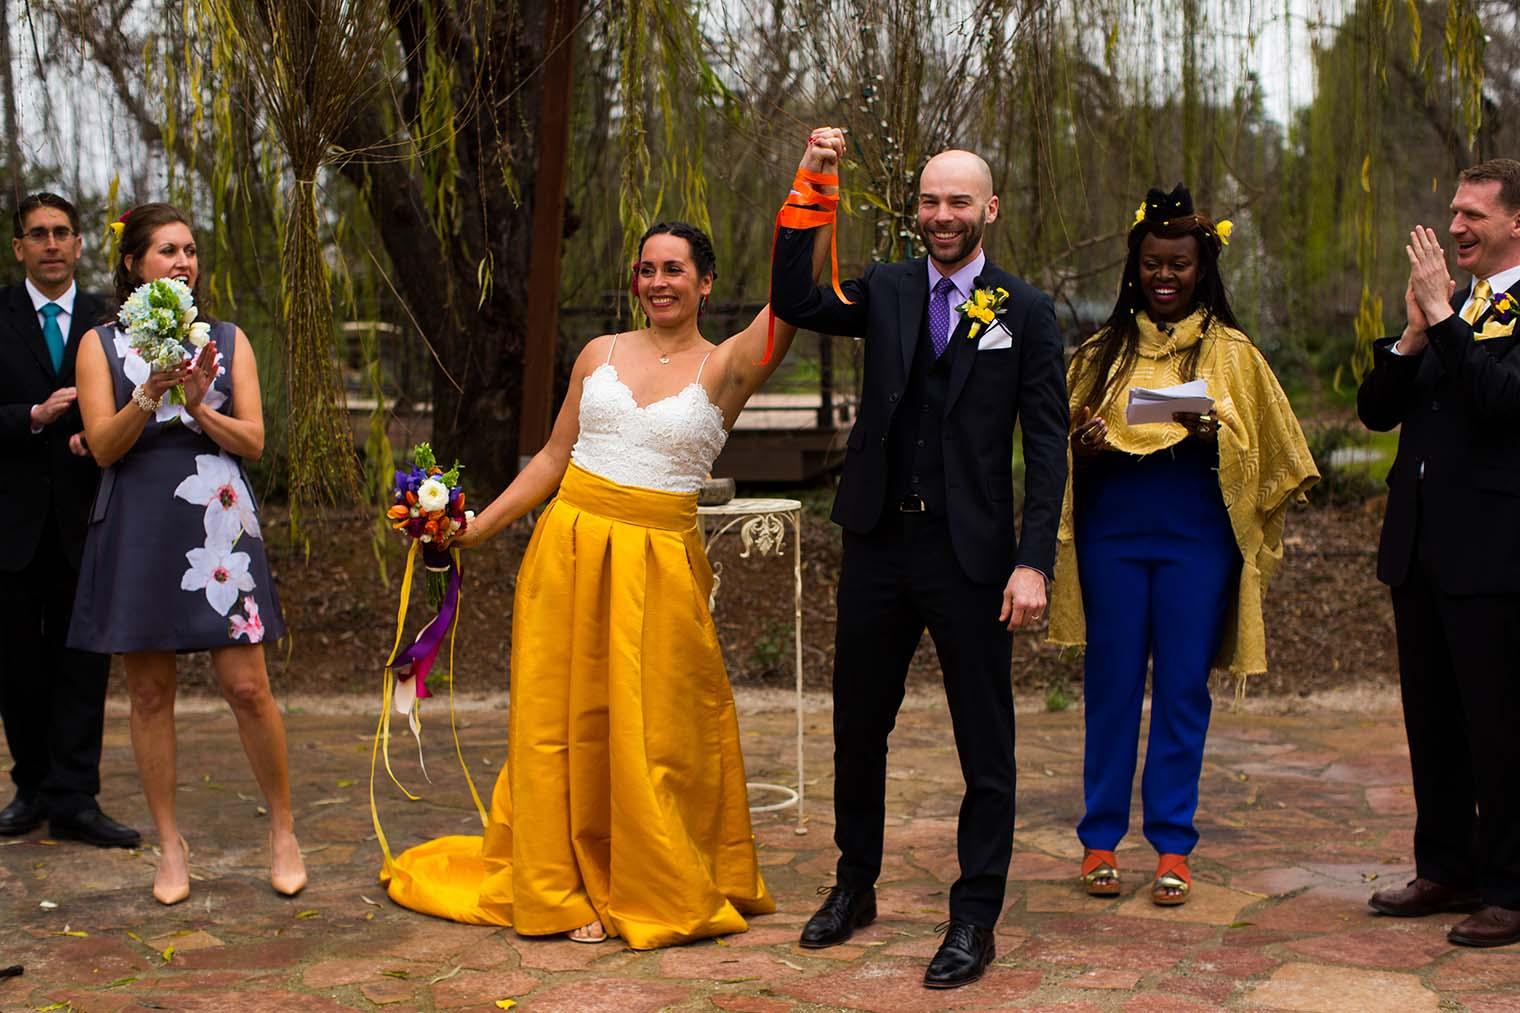 Union Hill Inn Wedding Ceremony